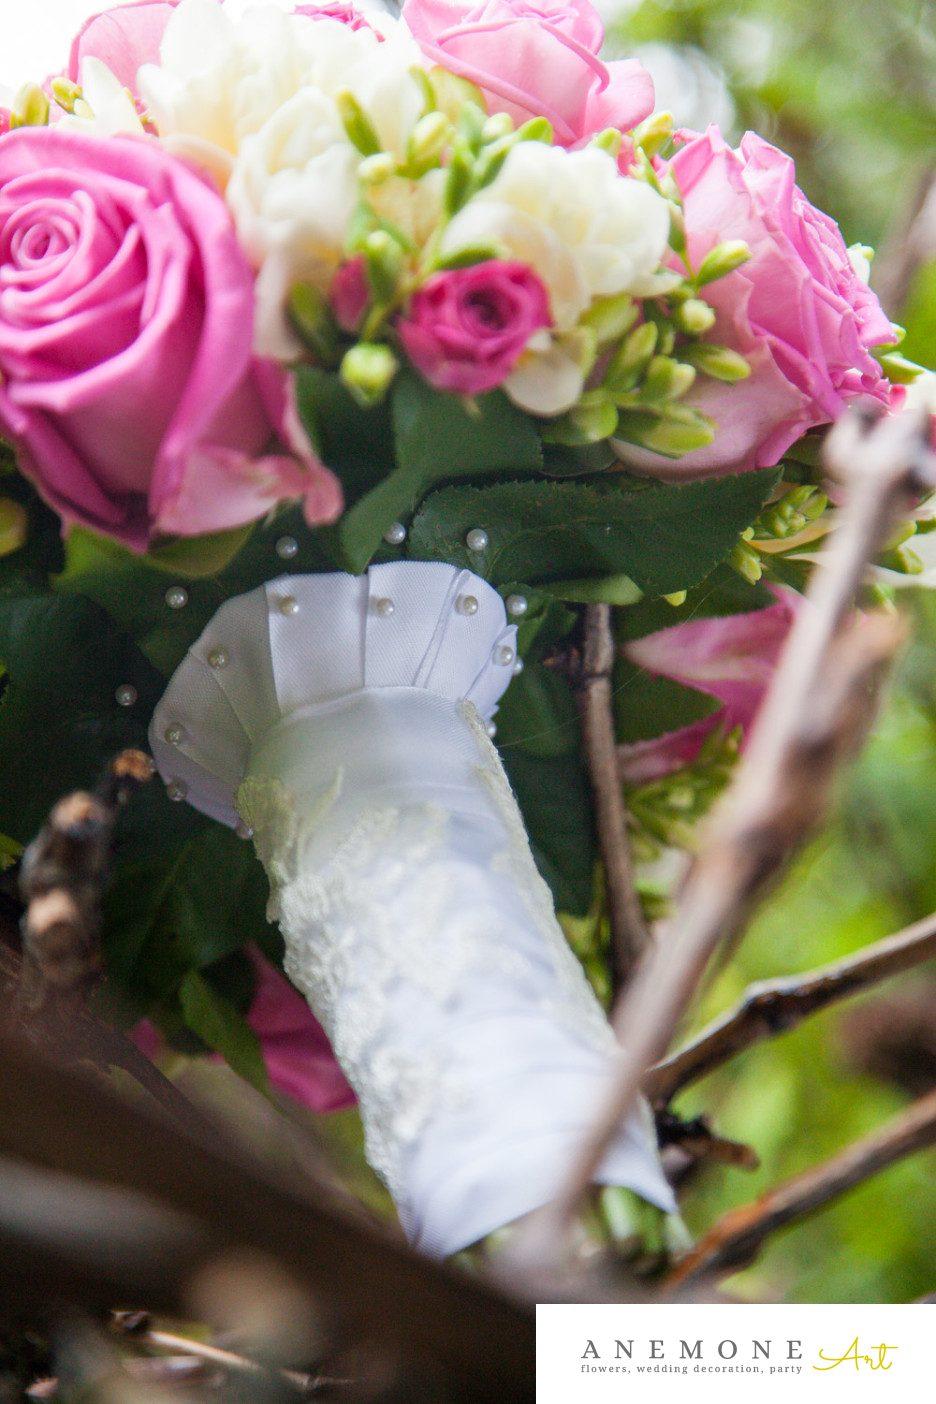 Poza, foto cu Flori de nunta buchet mireasa, maner buchet, rotund, roz, trandafiri in Arad, Timisoara, Oradea (wedding flowers, bouquets) nunta Arad, Timisoara, Oradea